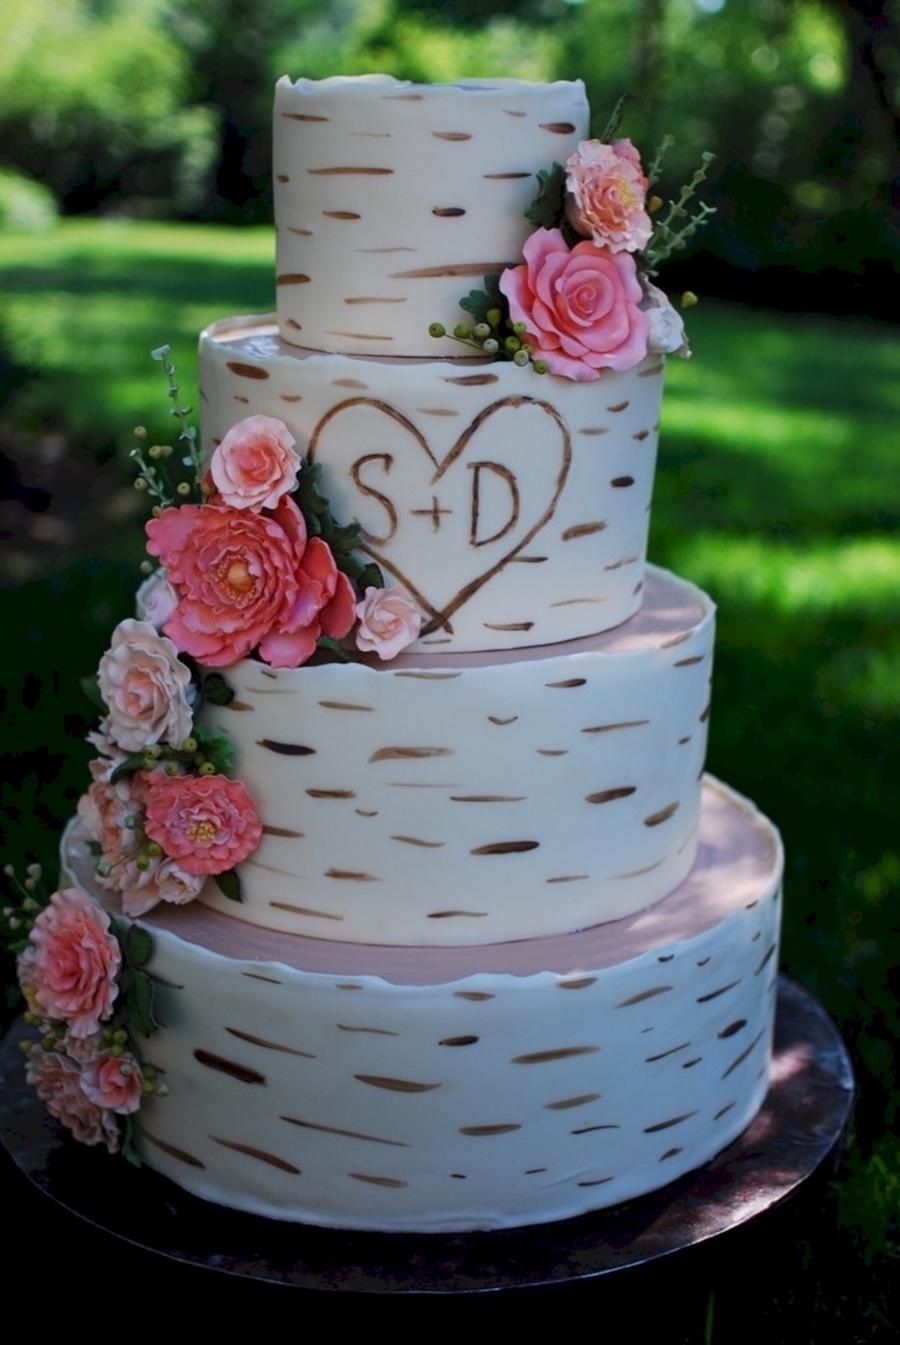 Naked Birch 3Tier Wedding Cake - CakeCentral.com